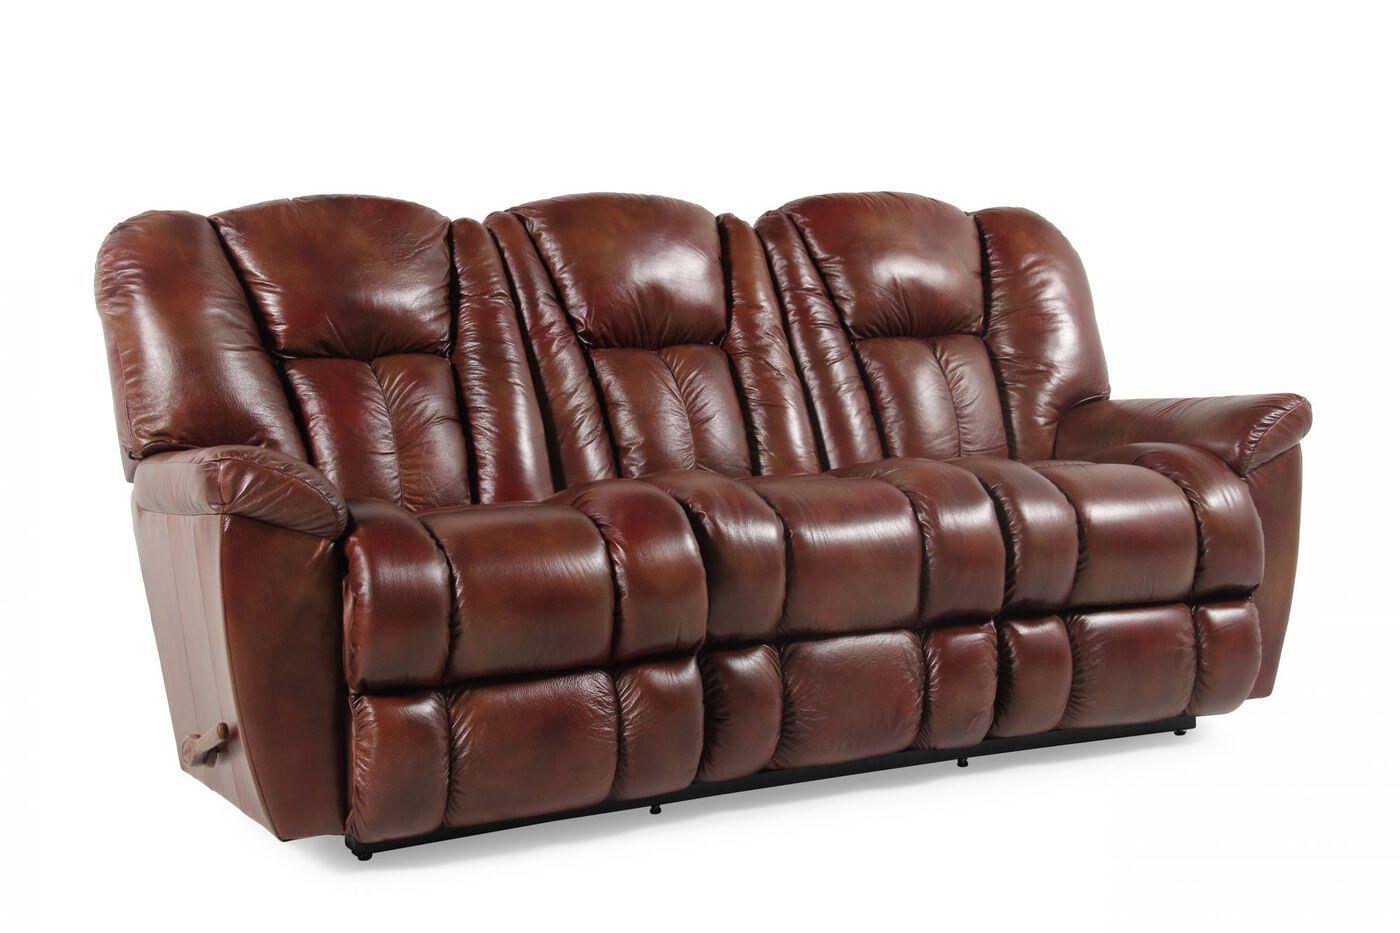 La Z Boy Maverick Mahogany Reclining Sofa Mathis Brothers Furniture